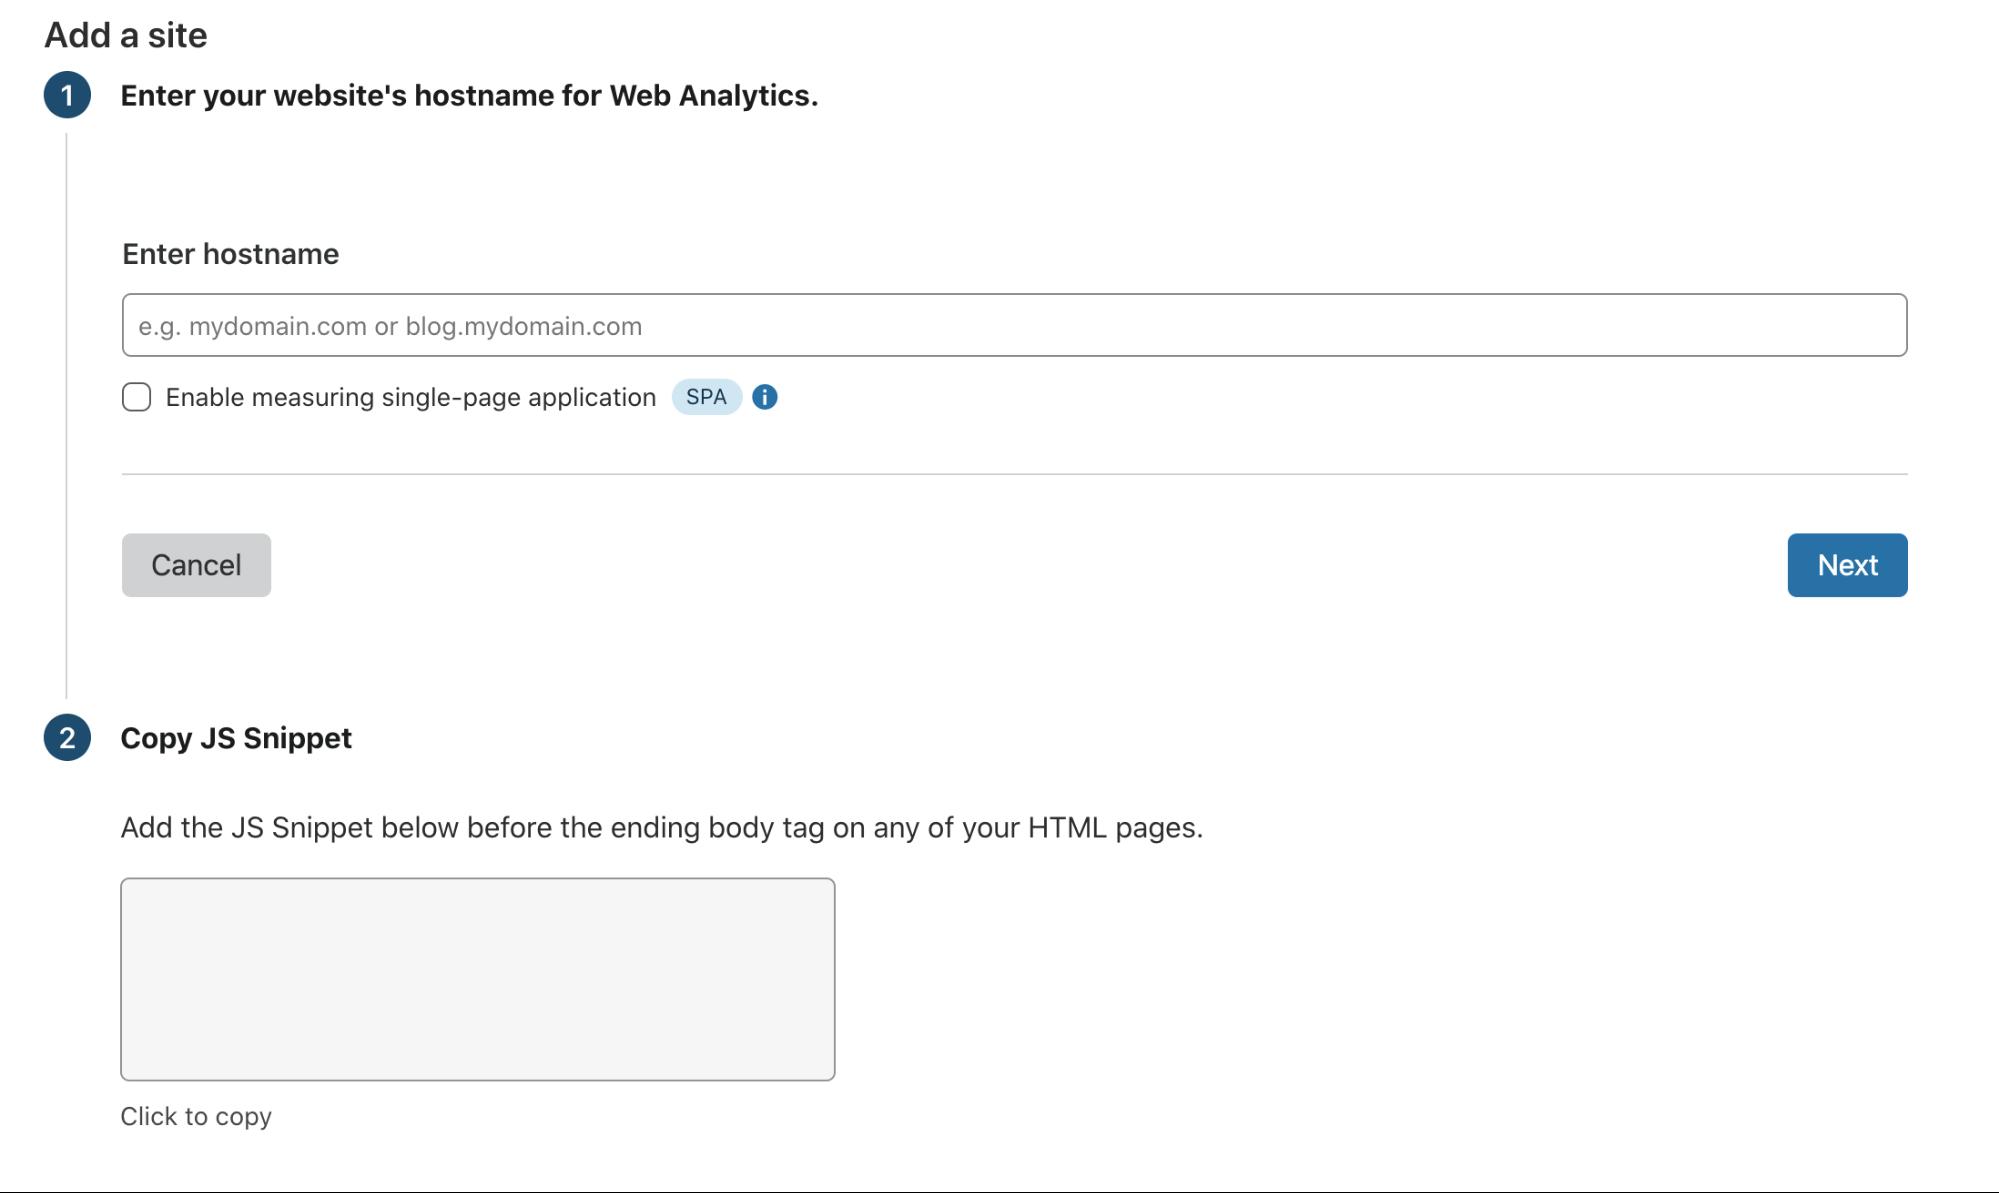 Enhancing privacy-focused Web Analytics to better meet your metrics needs